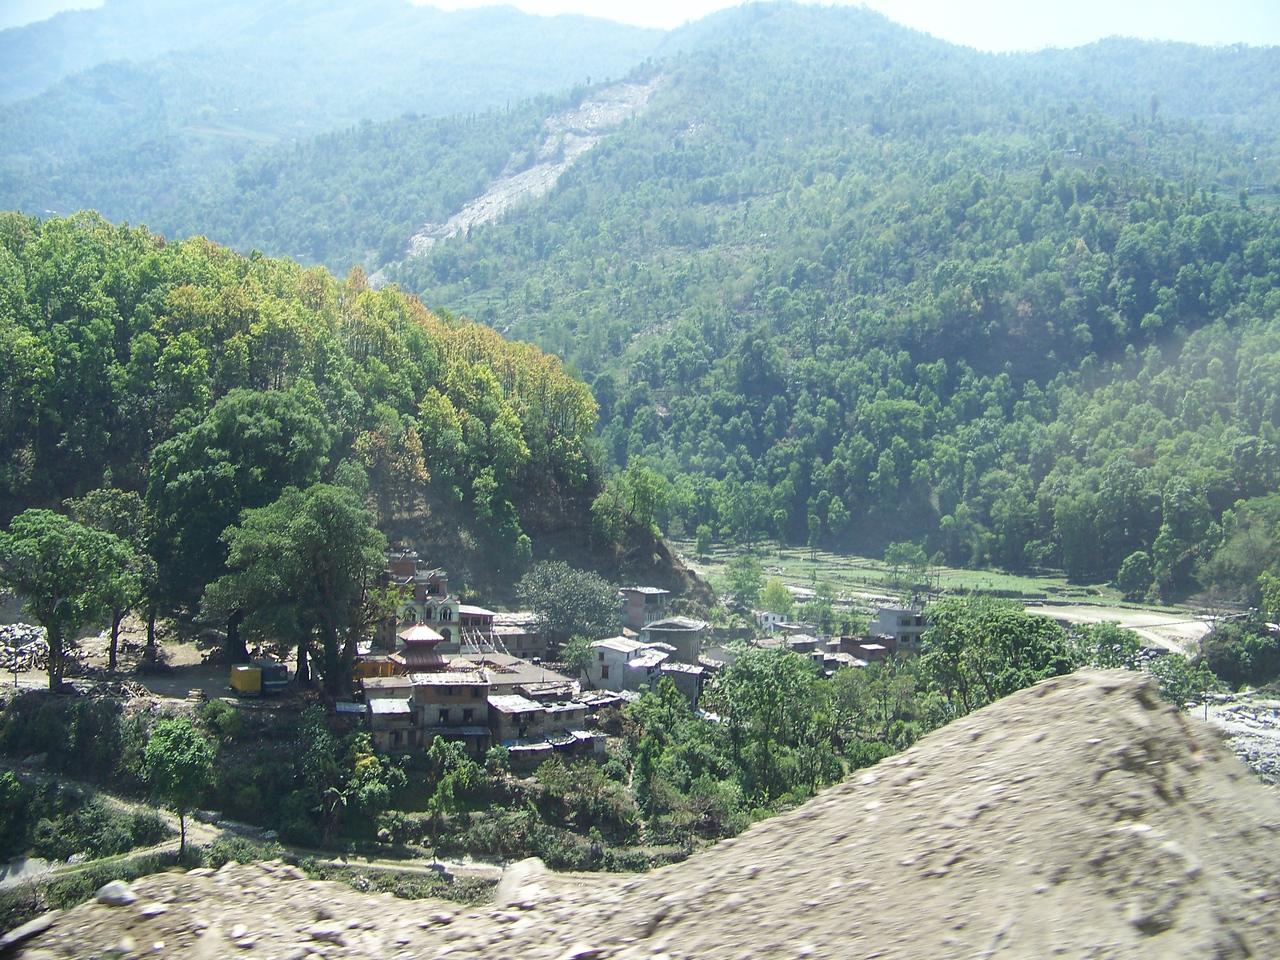 0651 - Scenery along Araniko Highway in Nepal Between Kodari and Katmandu - Nepal.JPG